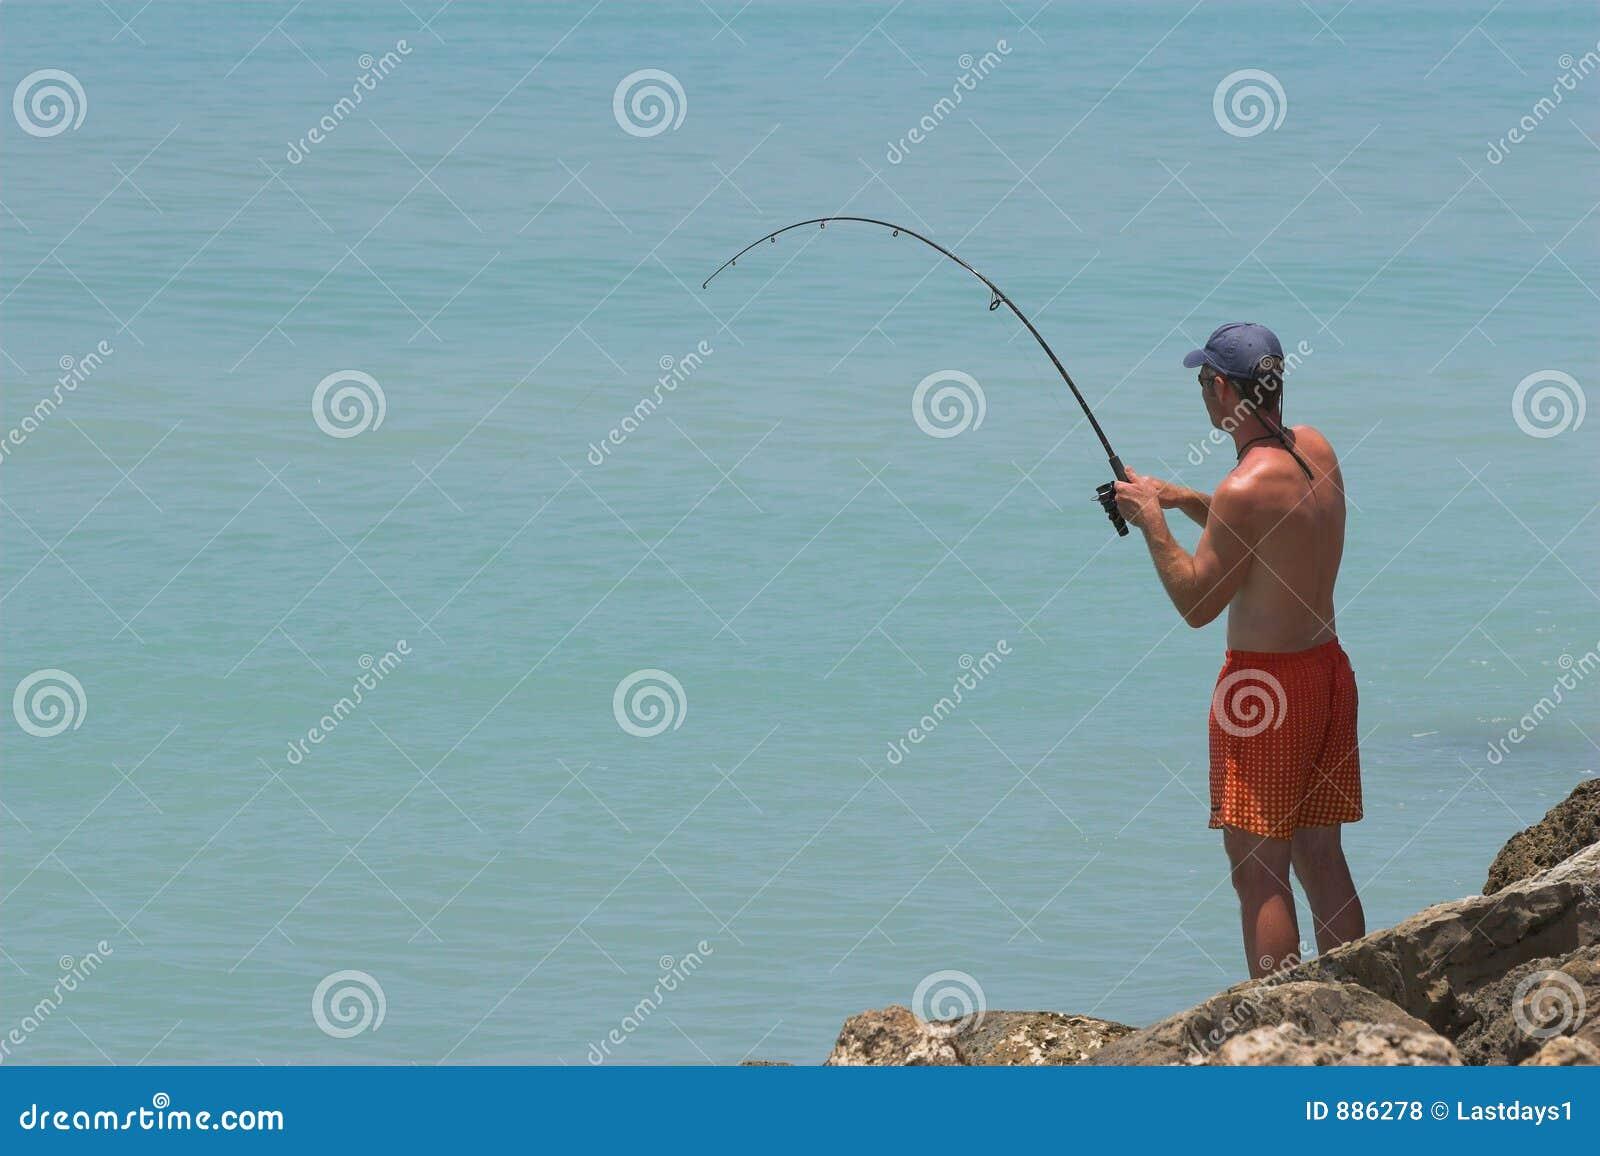 Fisherman Catching Fish Royalty Free Stock Photos